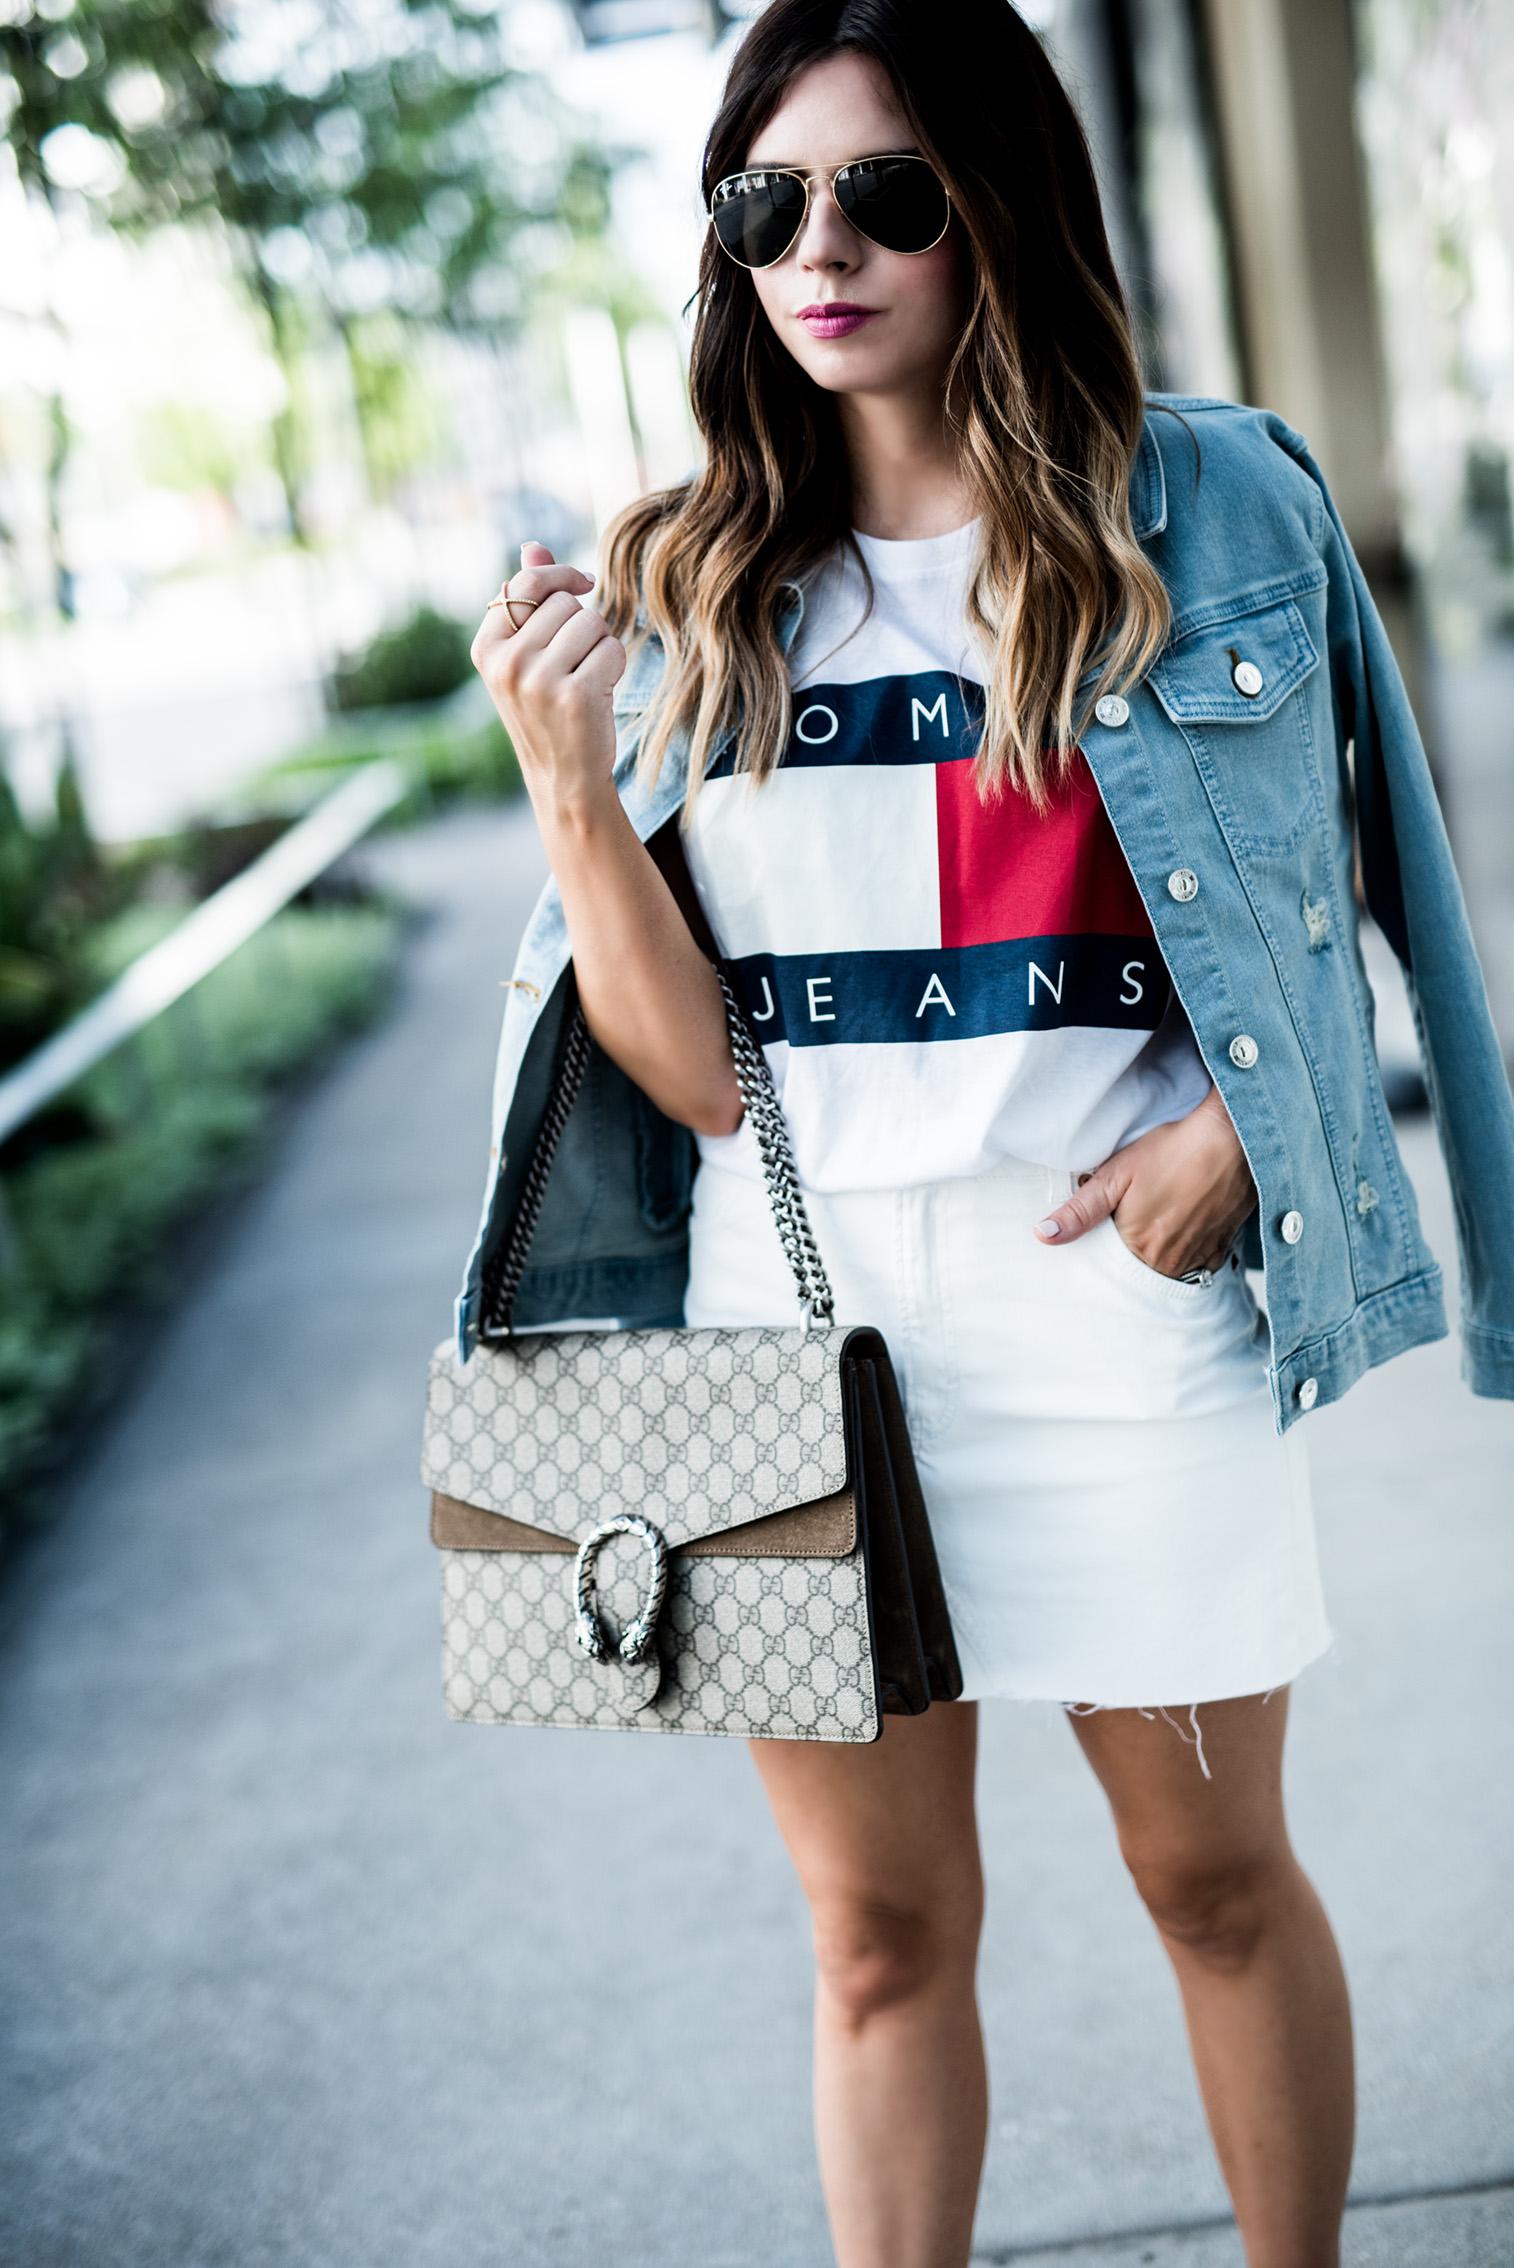 Houston fashion blogger Tiffany Jais | 90's Vibes - Tommy Hilfiger, classic logo tee, denim jacket outfits, streetstyle 2017